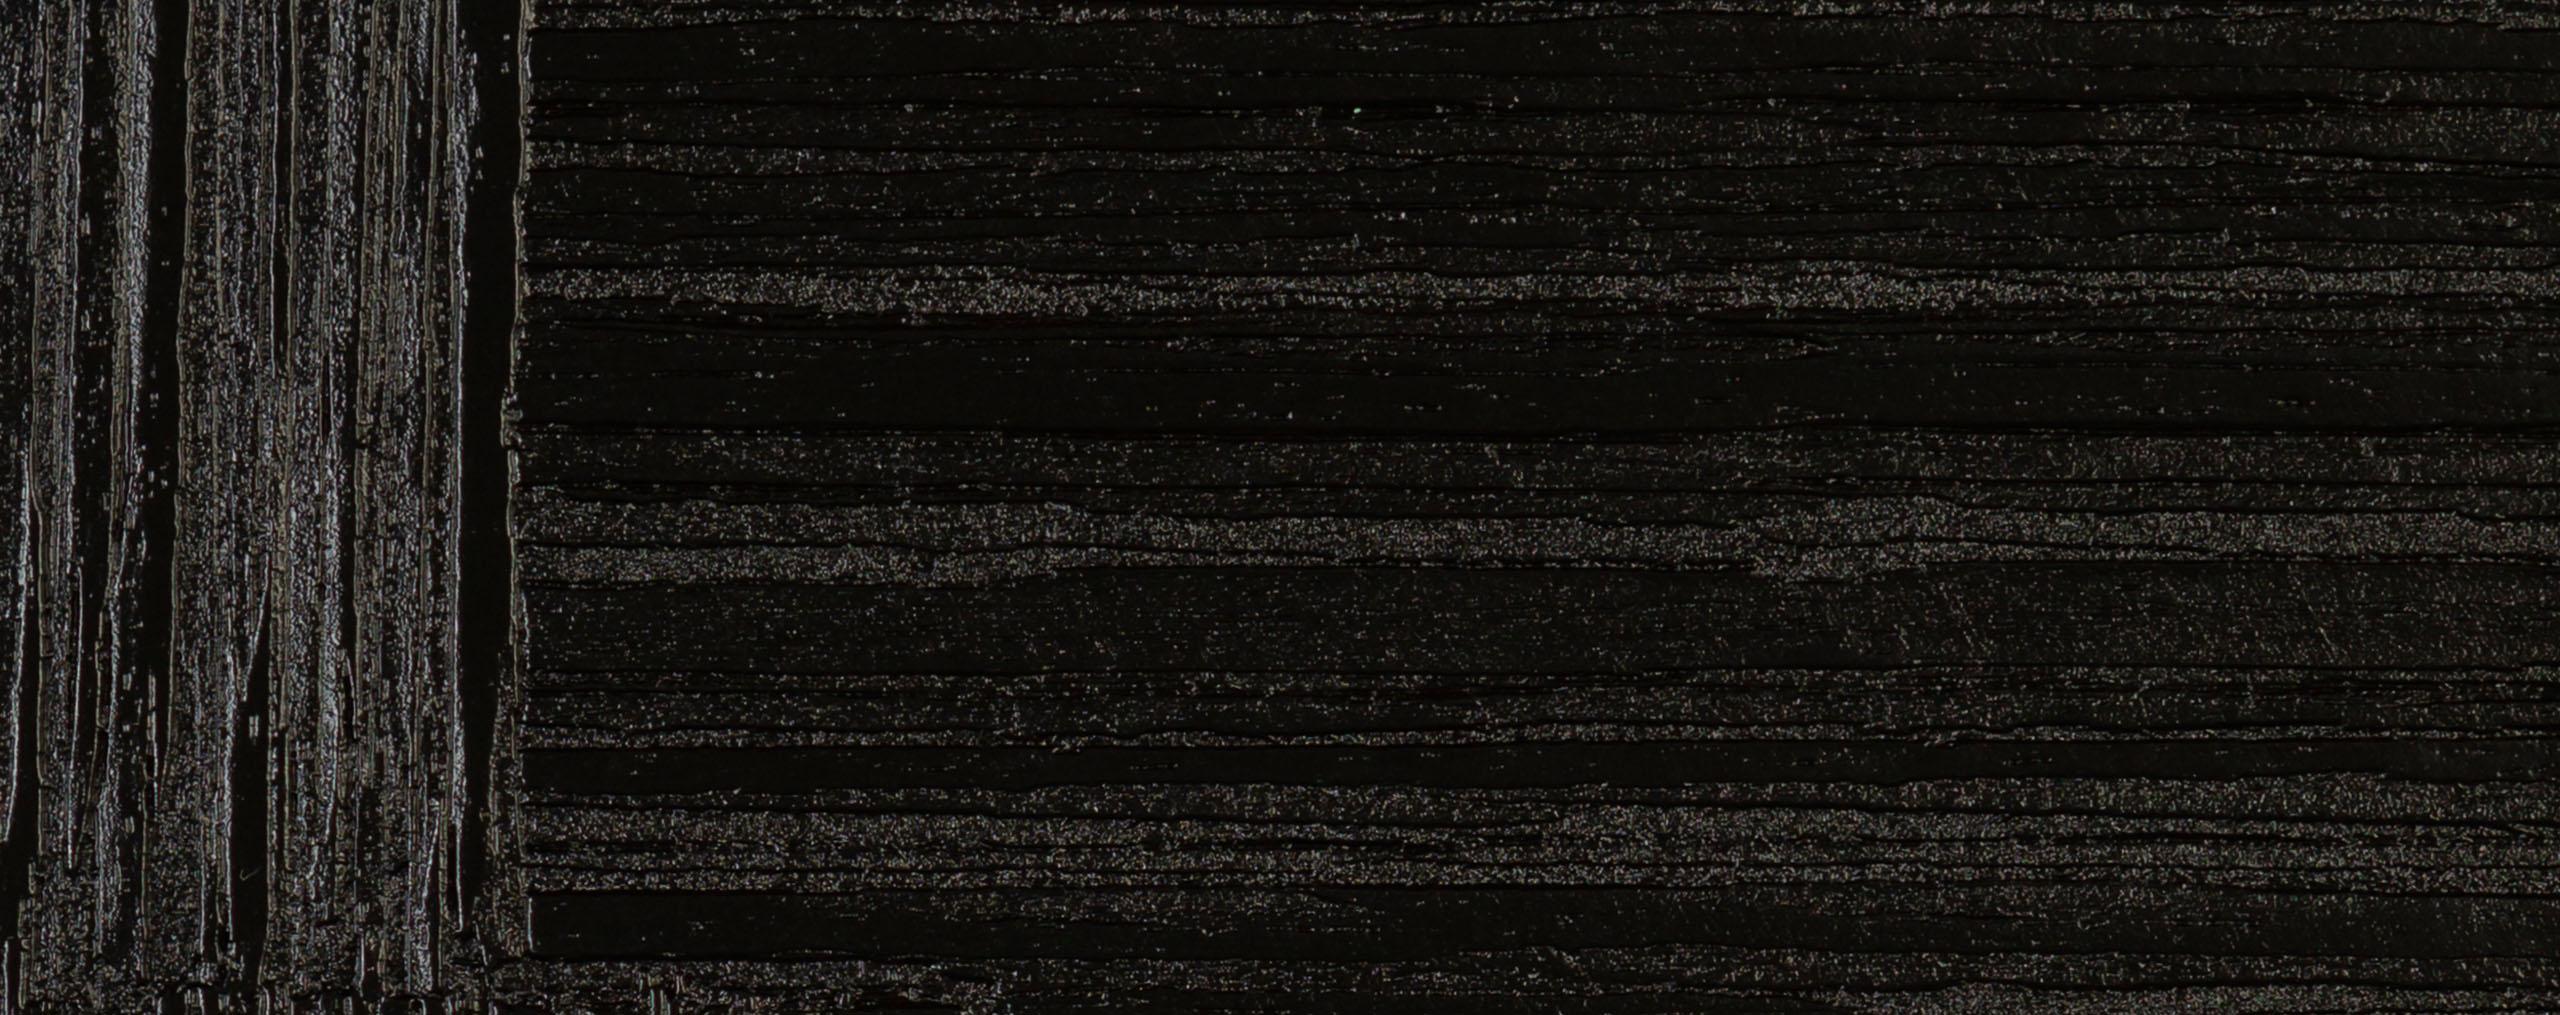 20763-7